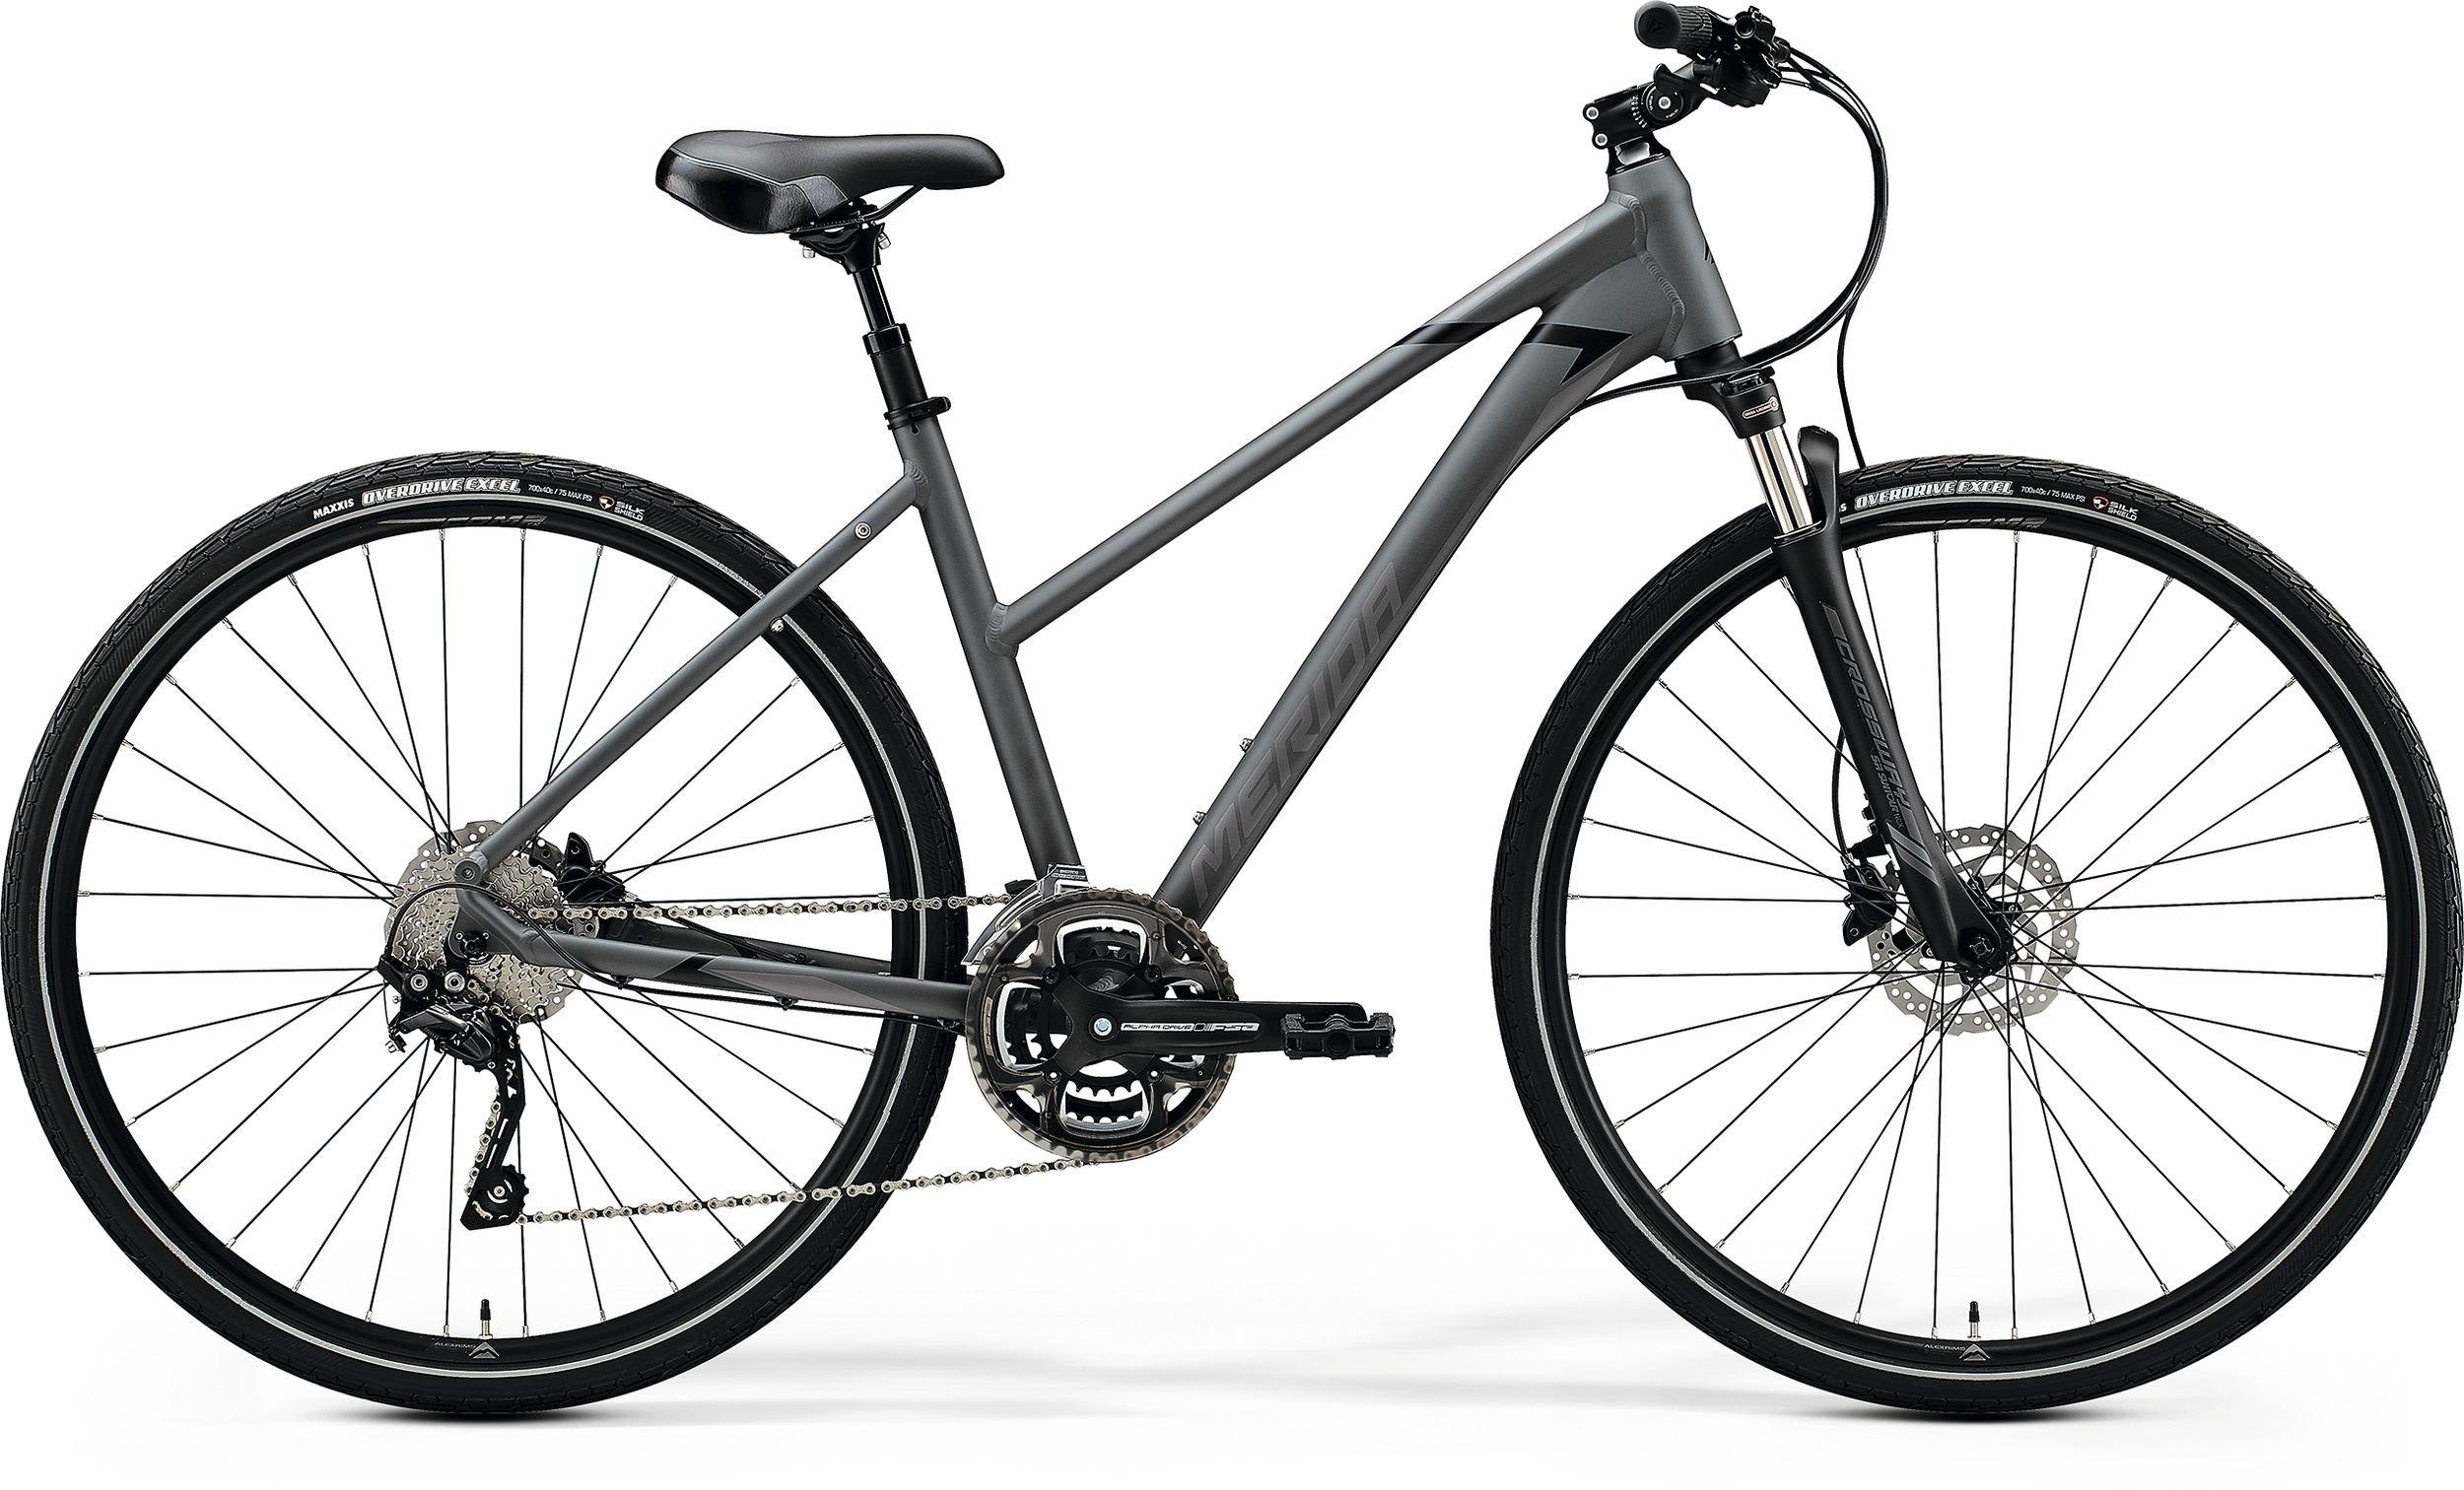 Merida CROSSWAY 300-LADY šedé/černé (150-160 cm)